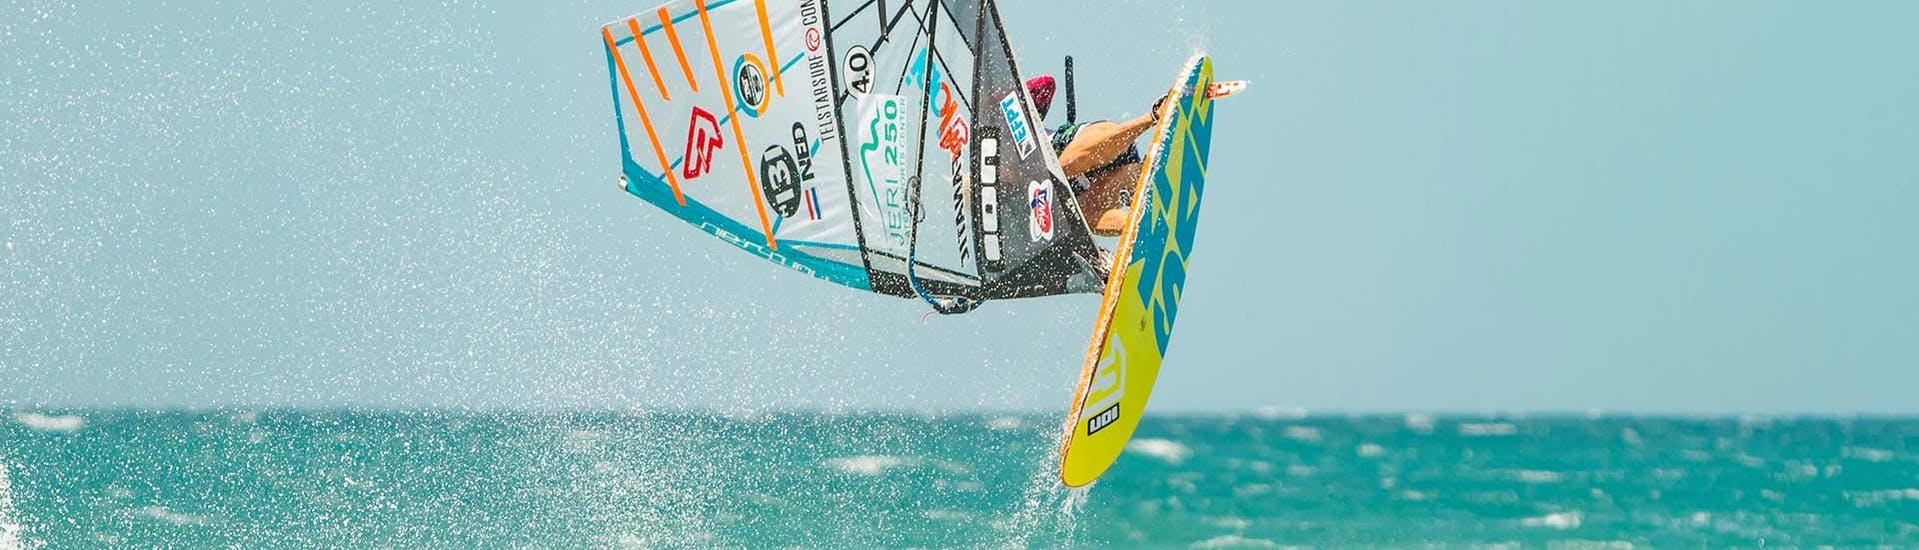 Advanced Windsurfing Lessons at Lister Ellenbogen with Kiteschule Sylt - Hero image